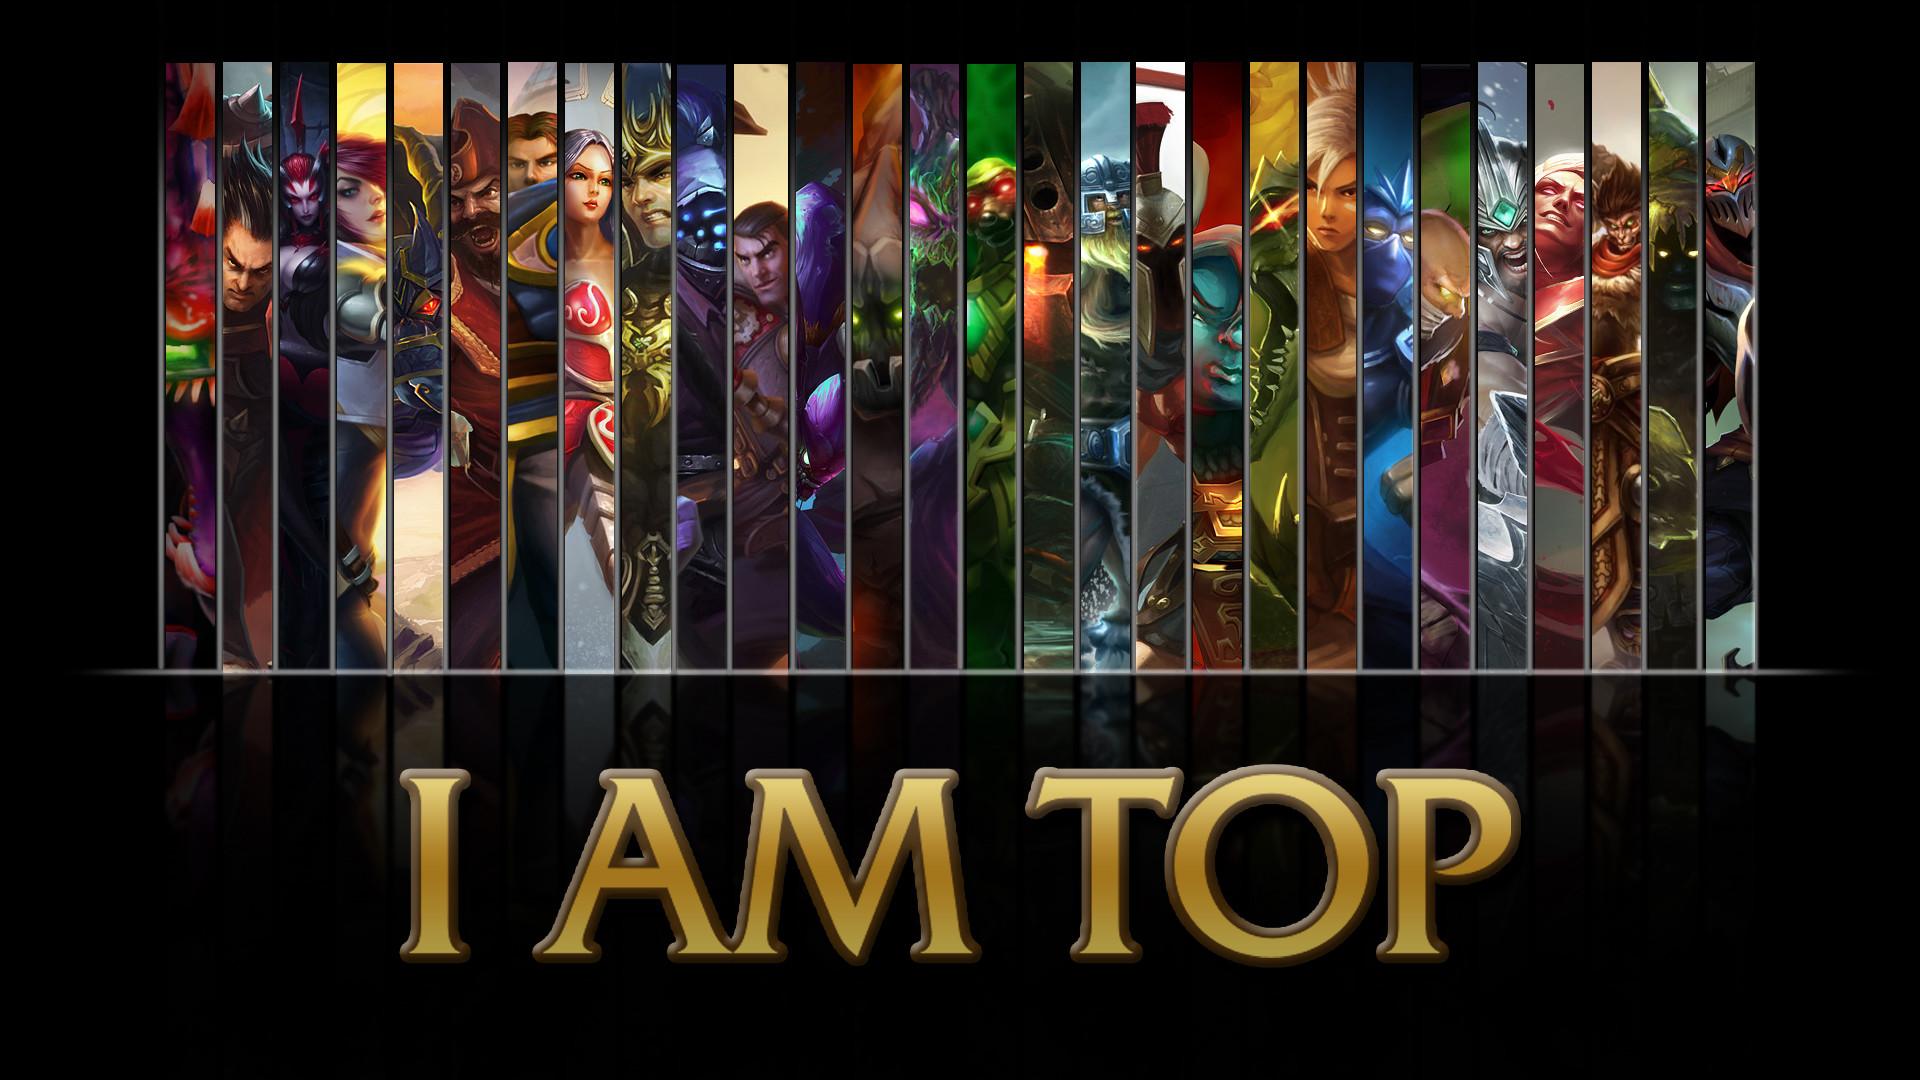 League of Legends I AM TOP wallpaper A wallpaper by NibblesMeKibbles